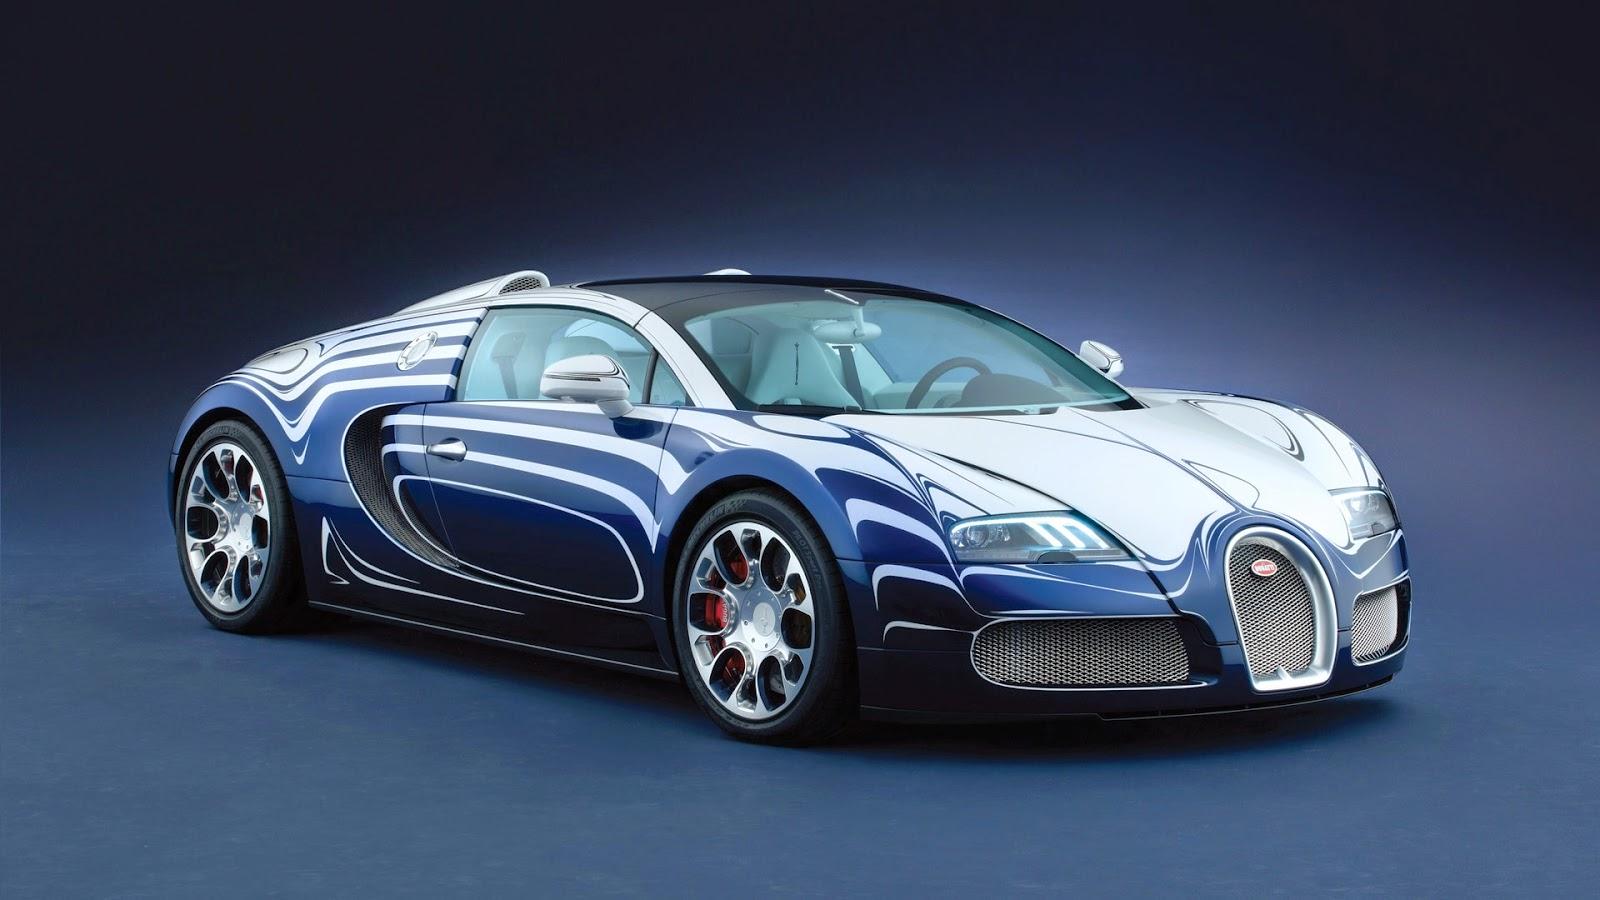 Allinallwalls Car Wallpapers 2014 Iphone car fast cool 1600x900